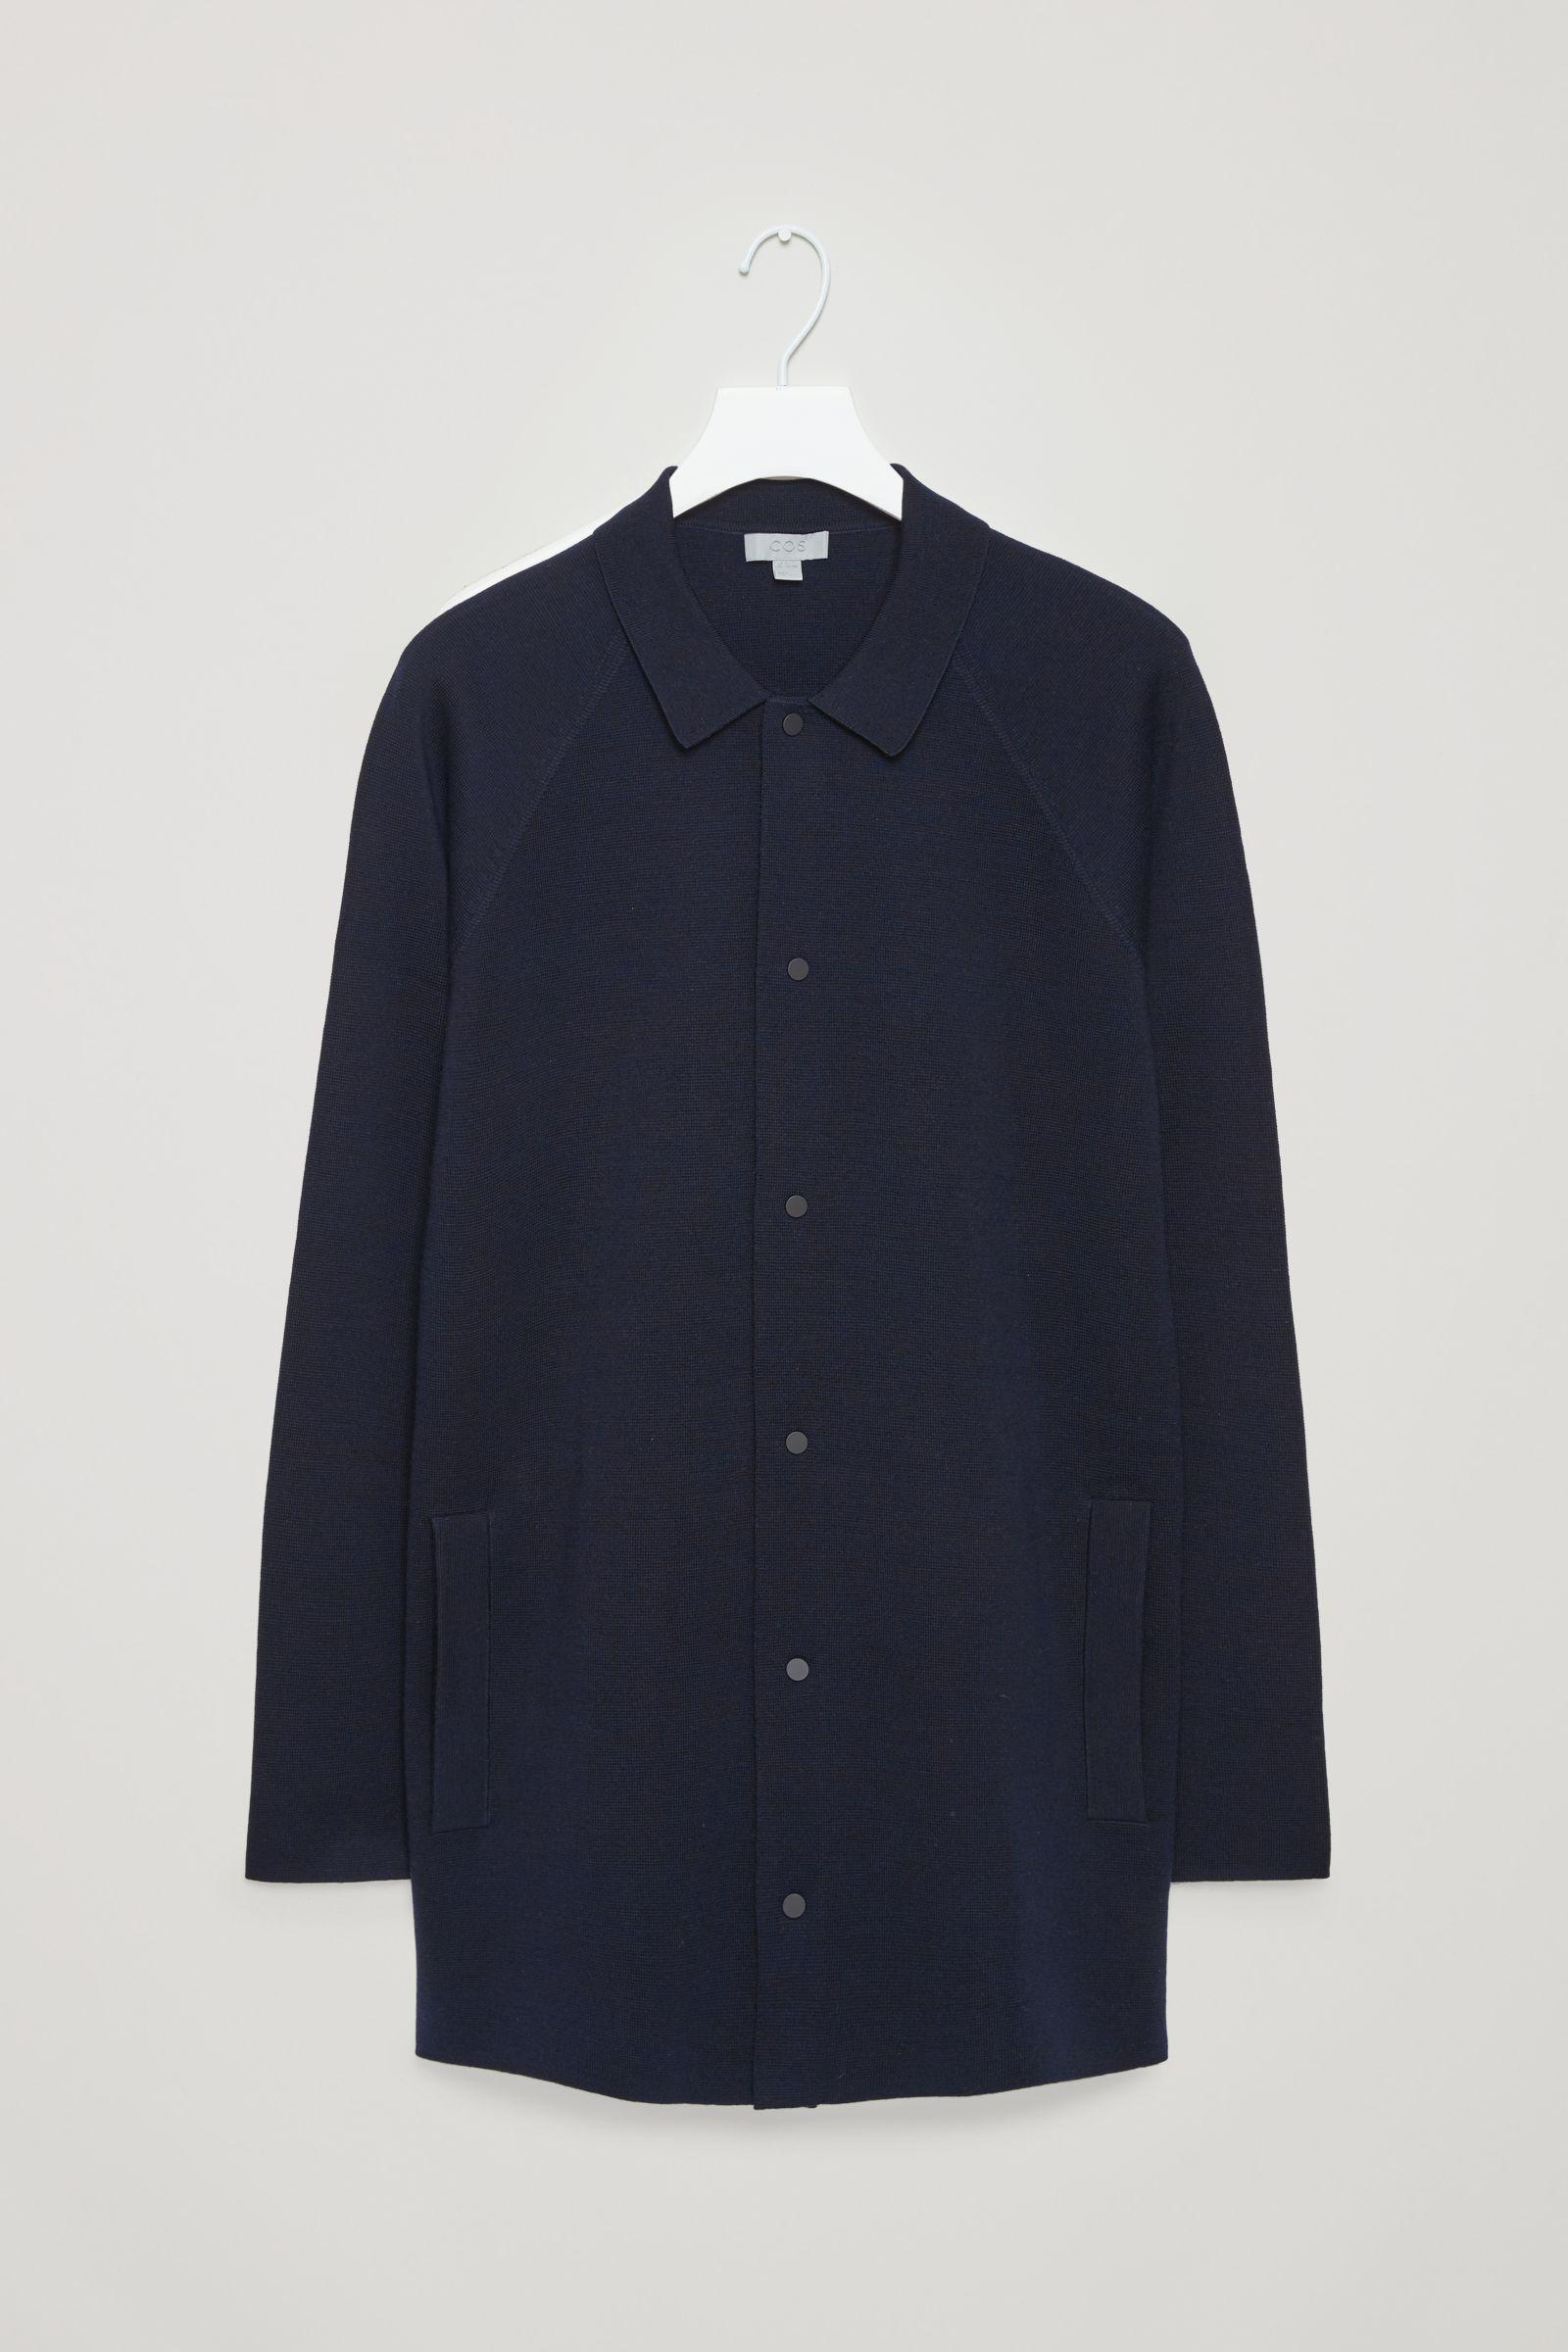 COS Wool Long Cardigan Jacket in Navy (Blue) for Men